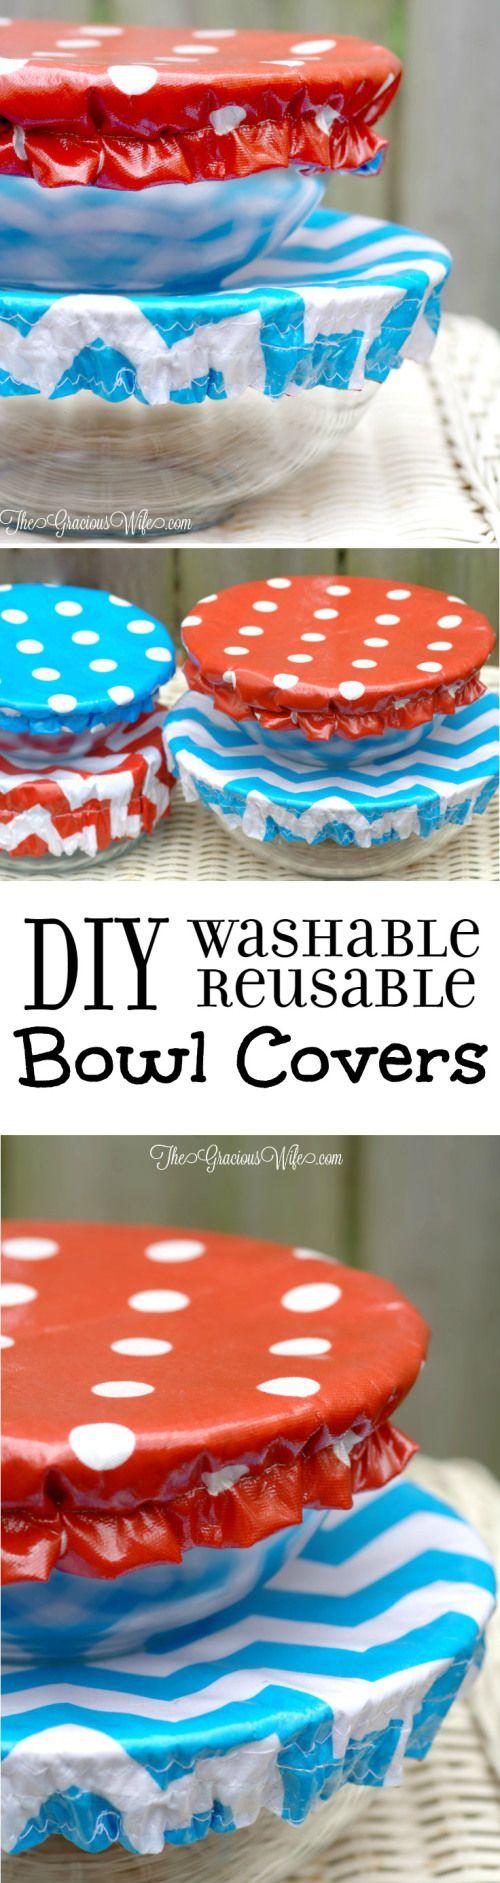 Diy Reusable Book Cover : Diy washable reusable bowl covers jewe